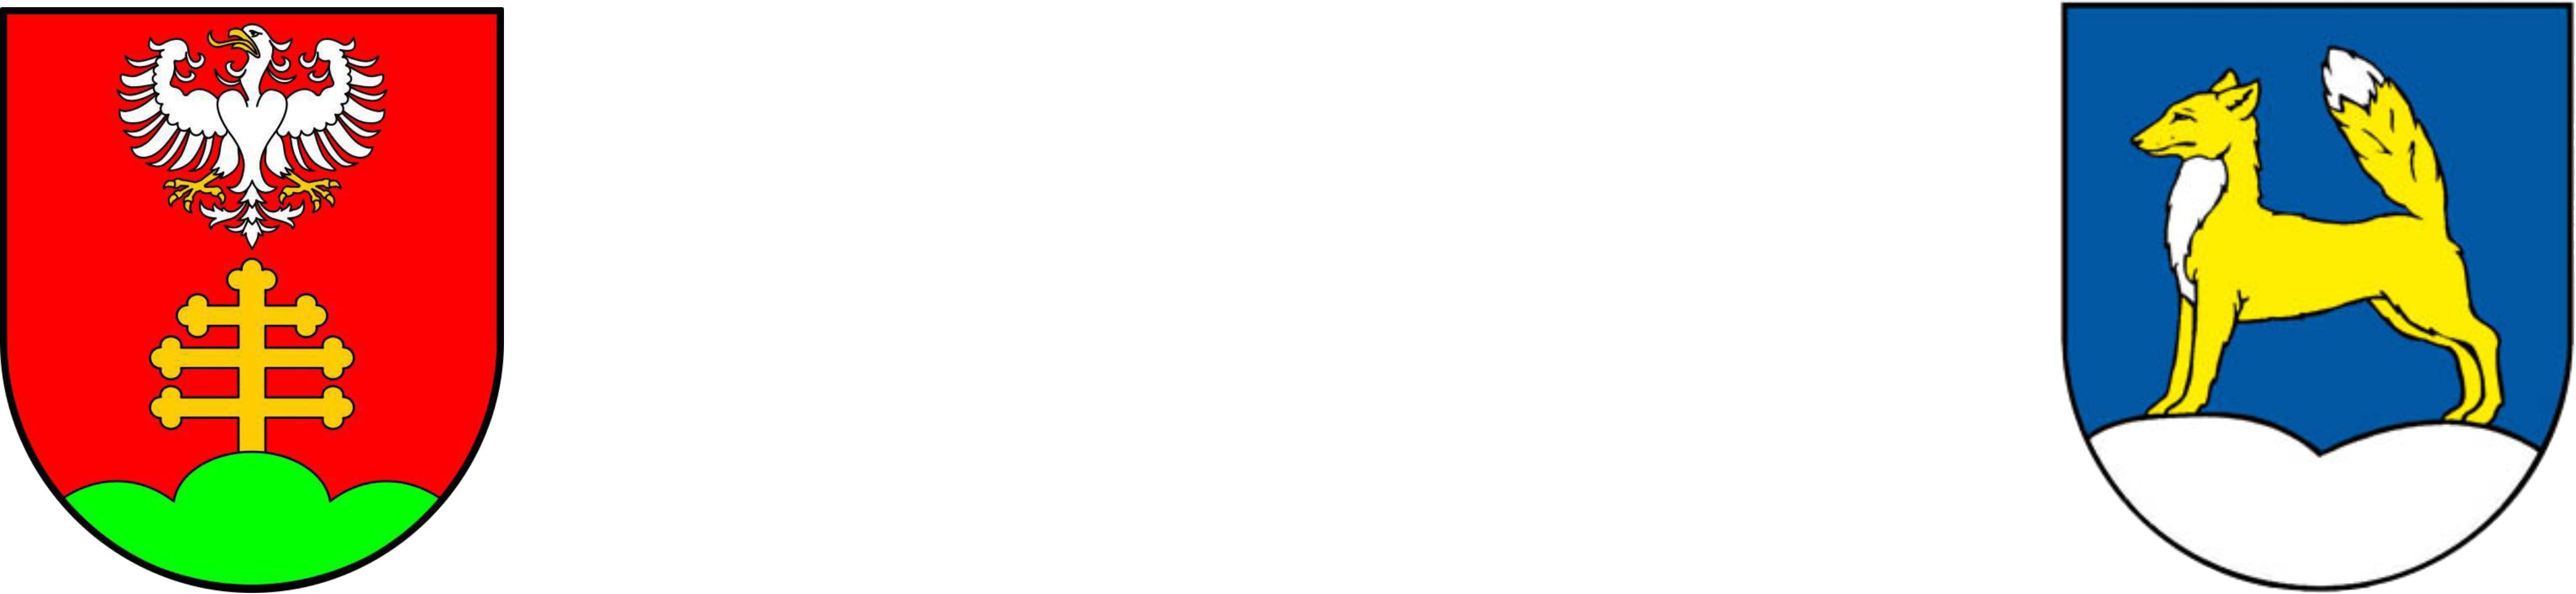 Loga Gmin